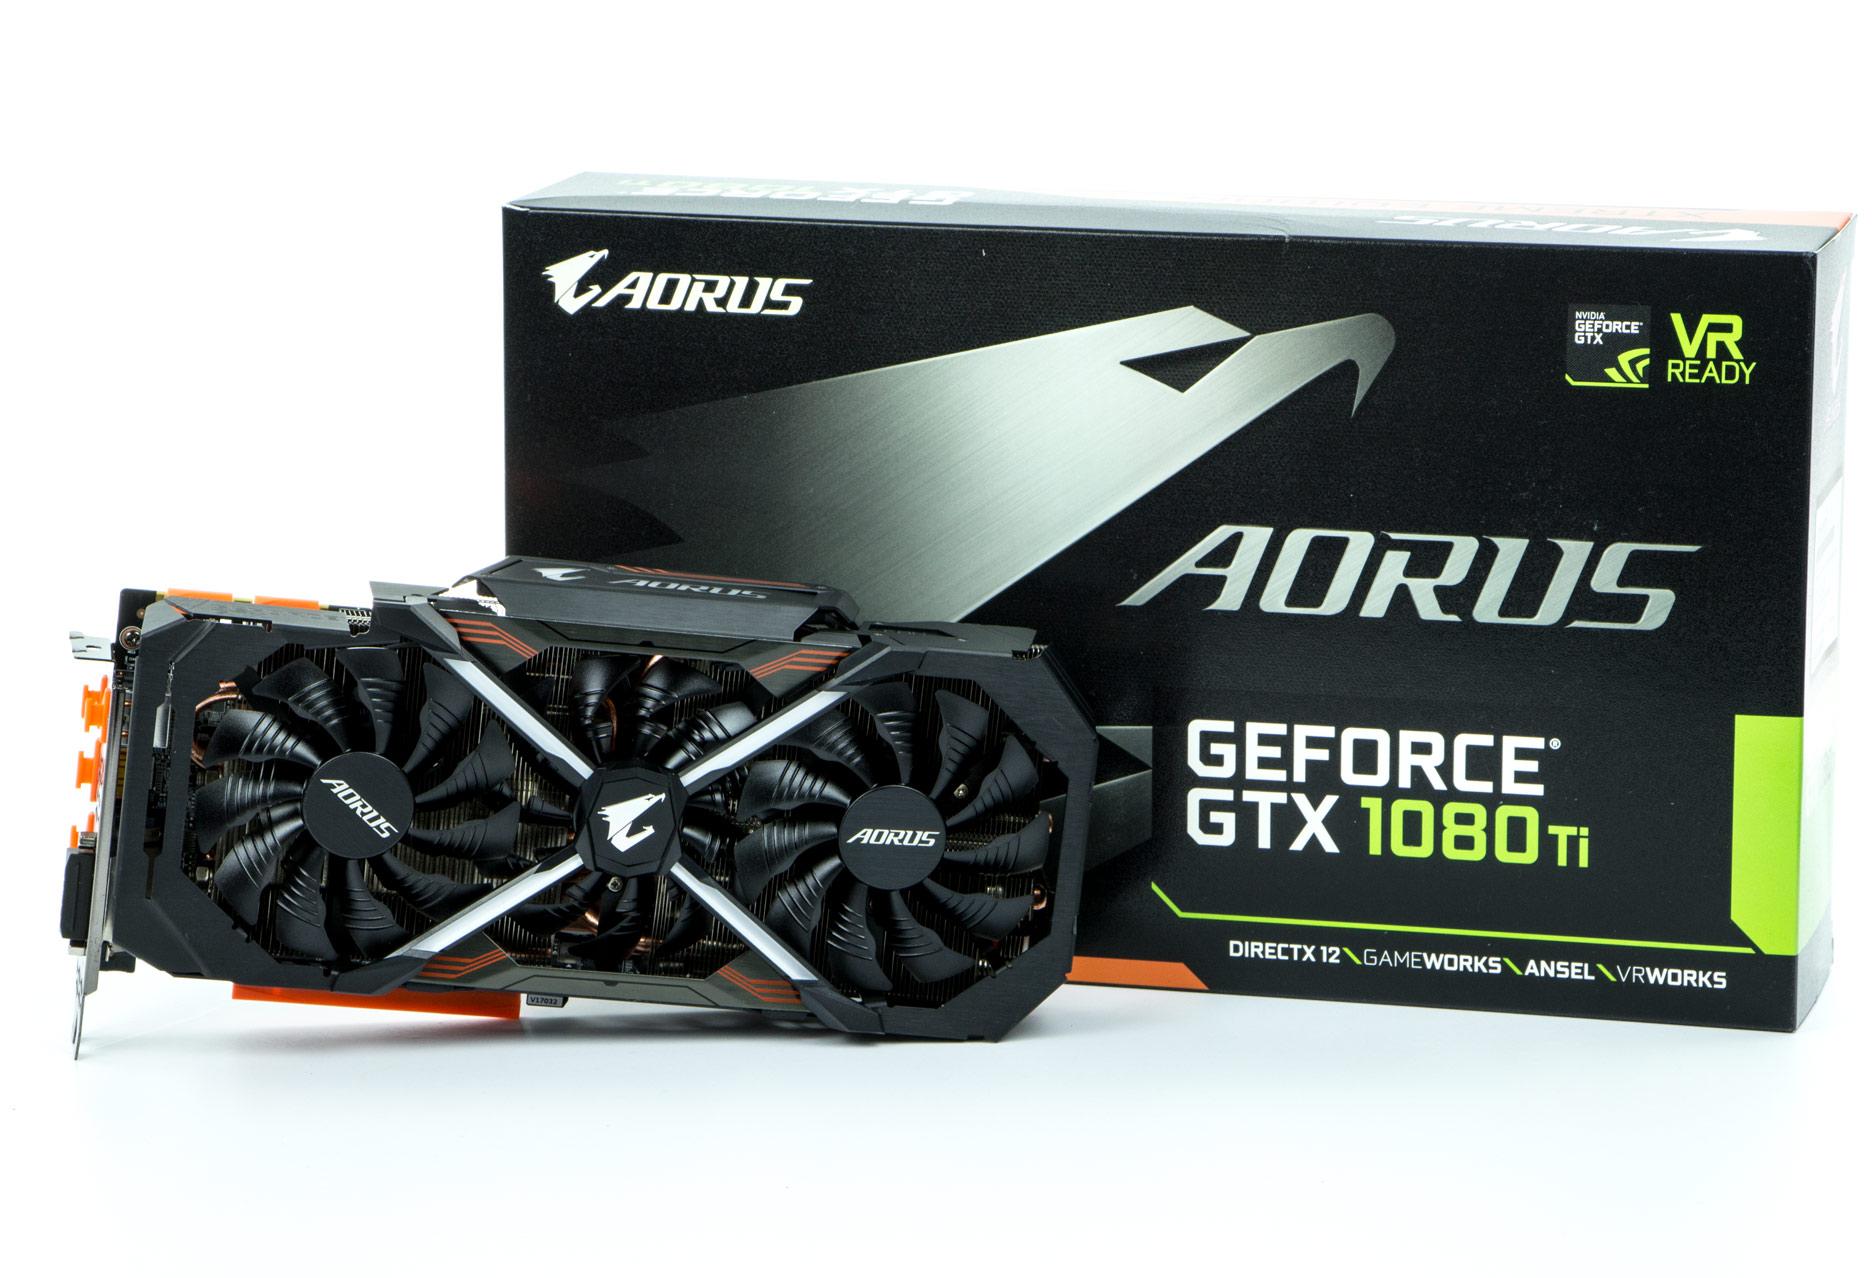 Gigabyte AORUS GeForce GTX 1080 Ti Xtreme Edition